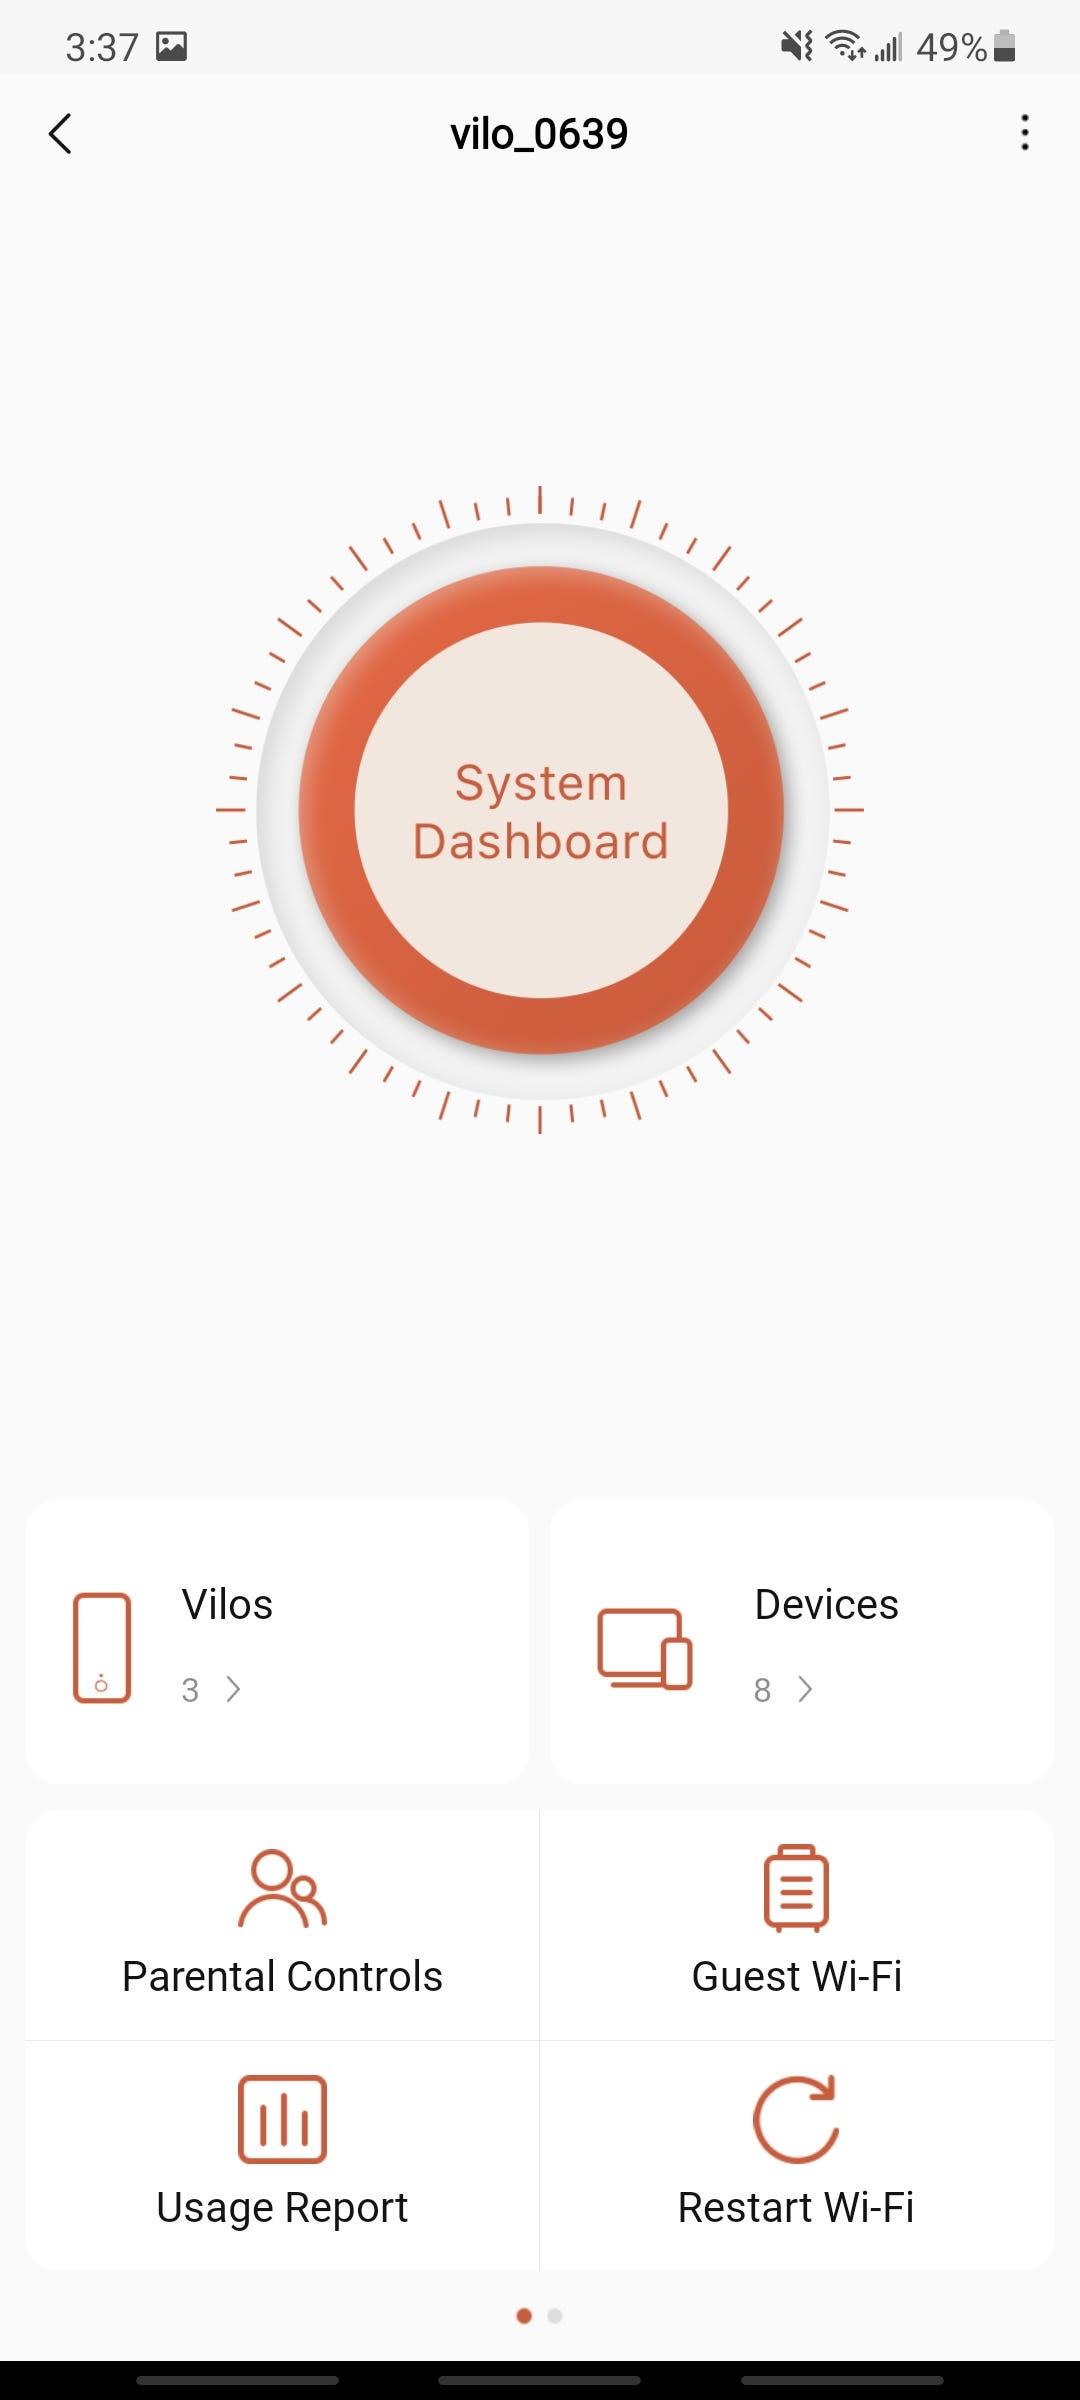 vilo living app home screen system dashboard